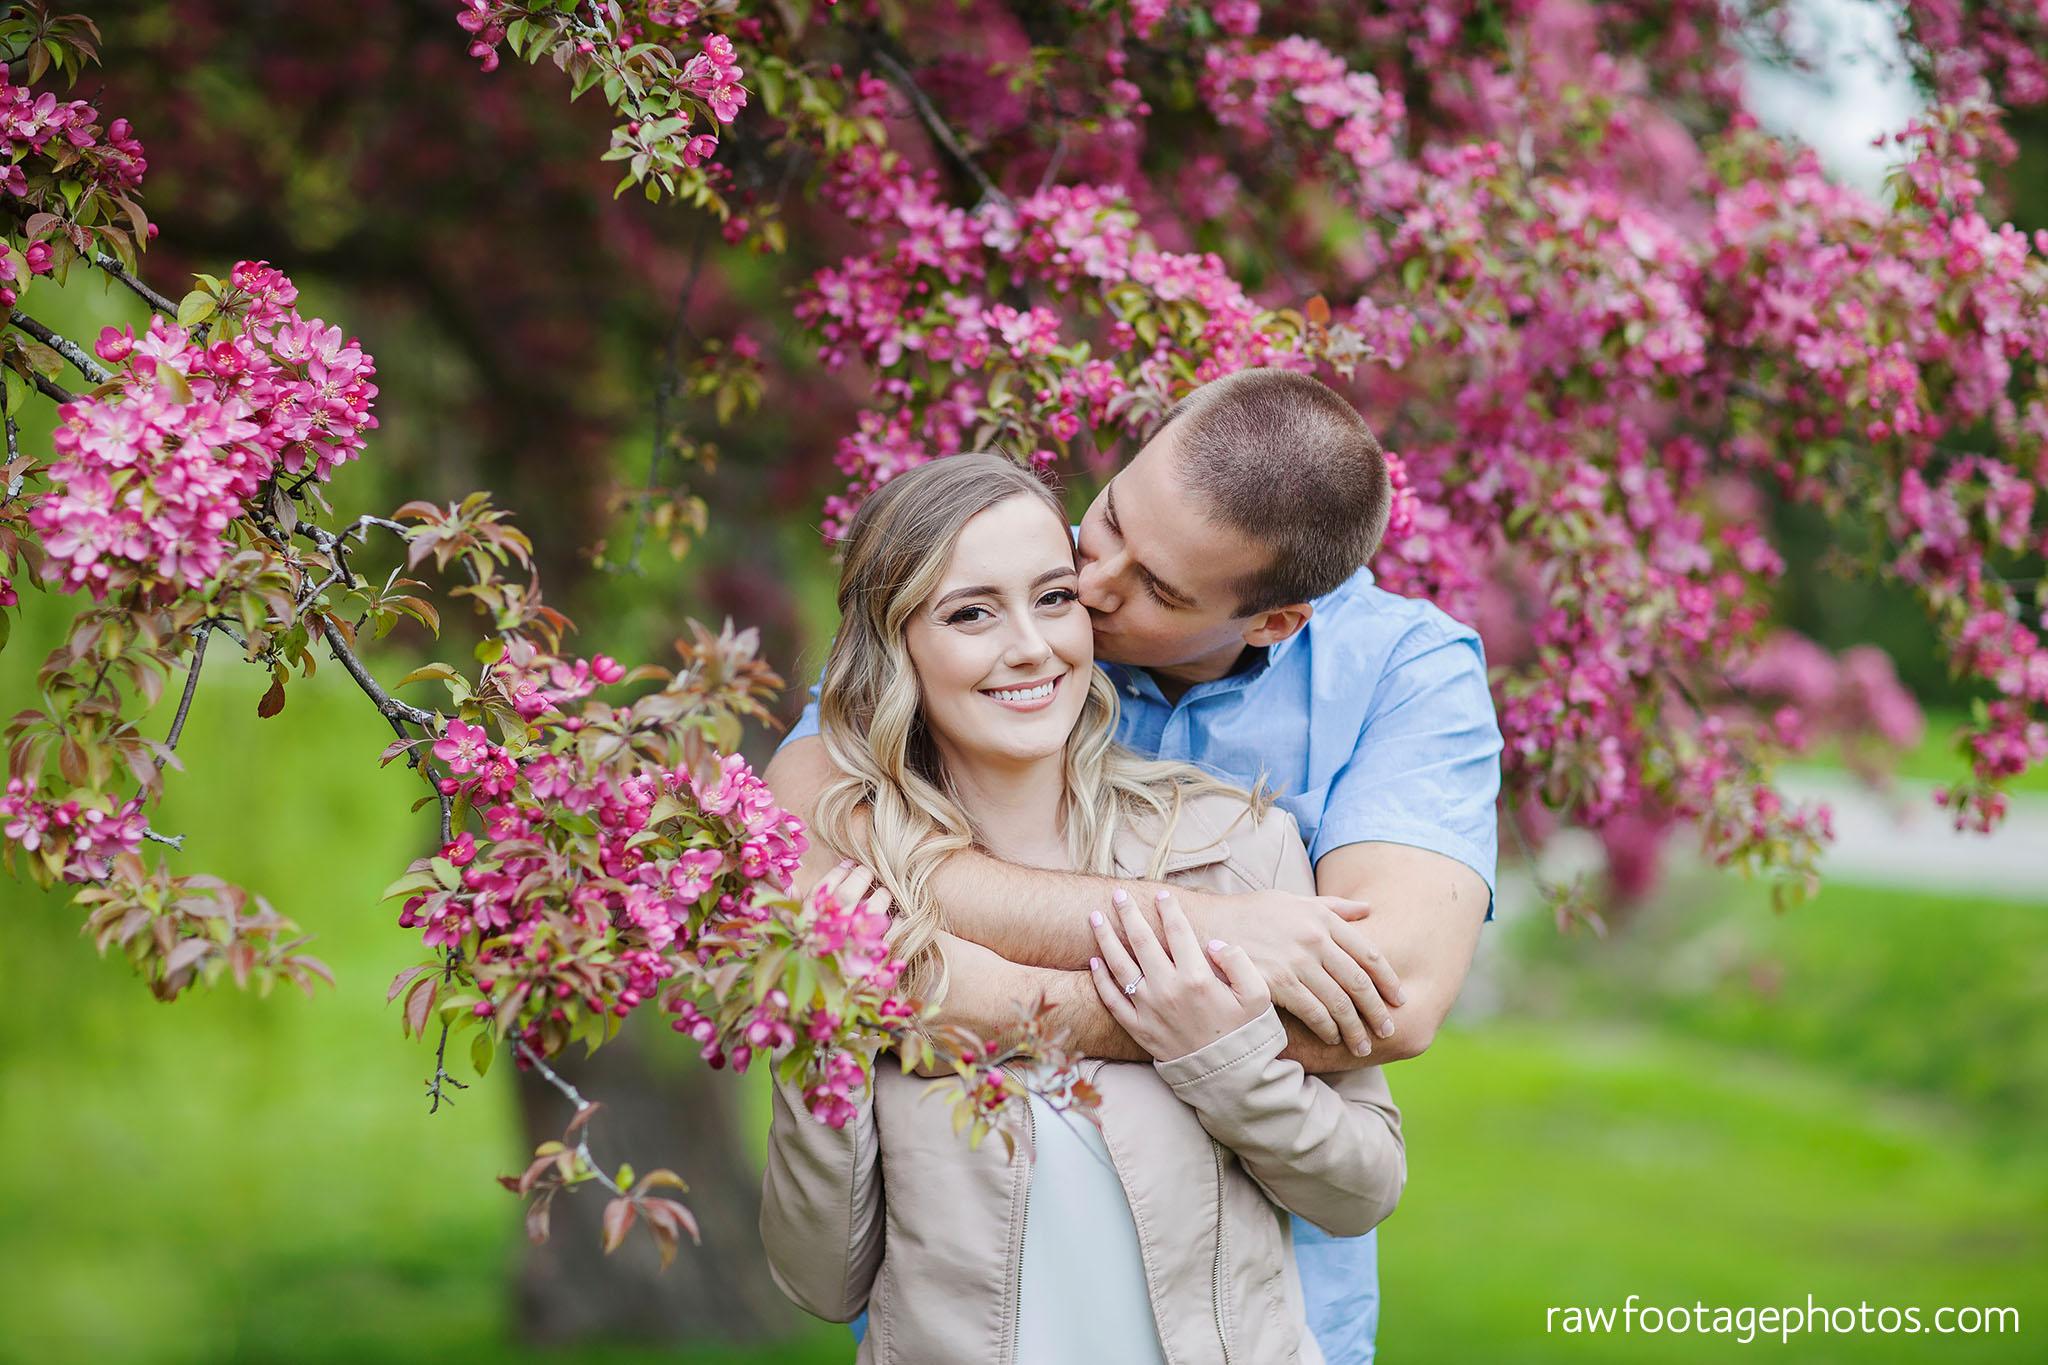 london_ontario_wedding_photographer-raw_footage_photography-engagement_session-engagement_photos-spring-blossoms-blooms006.jpg